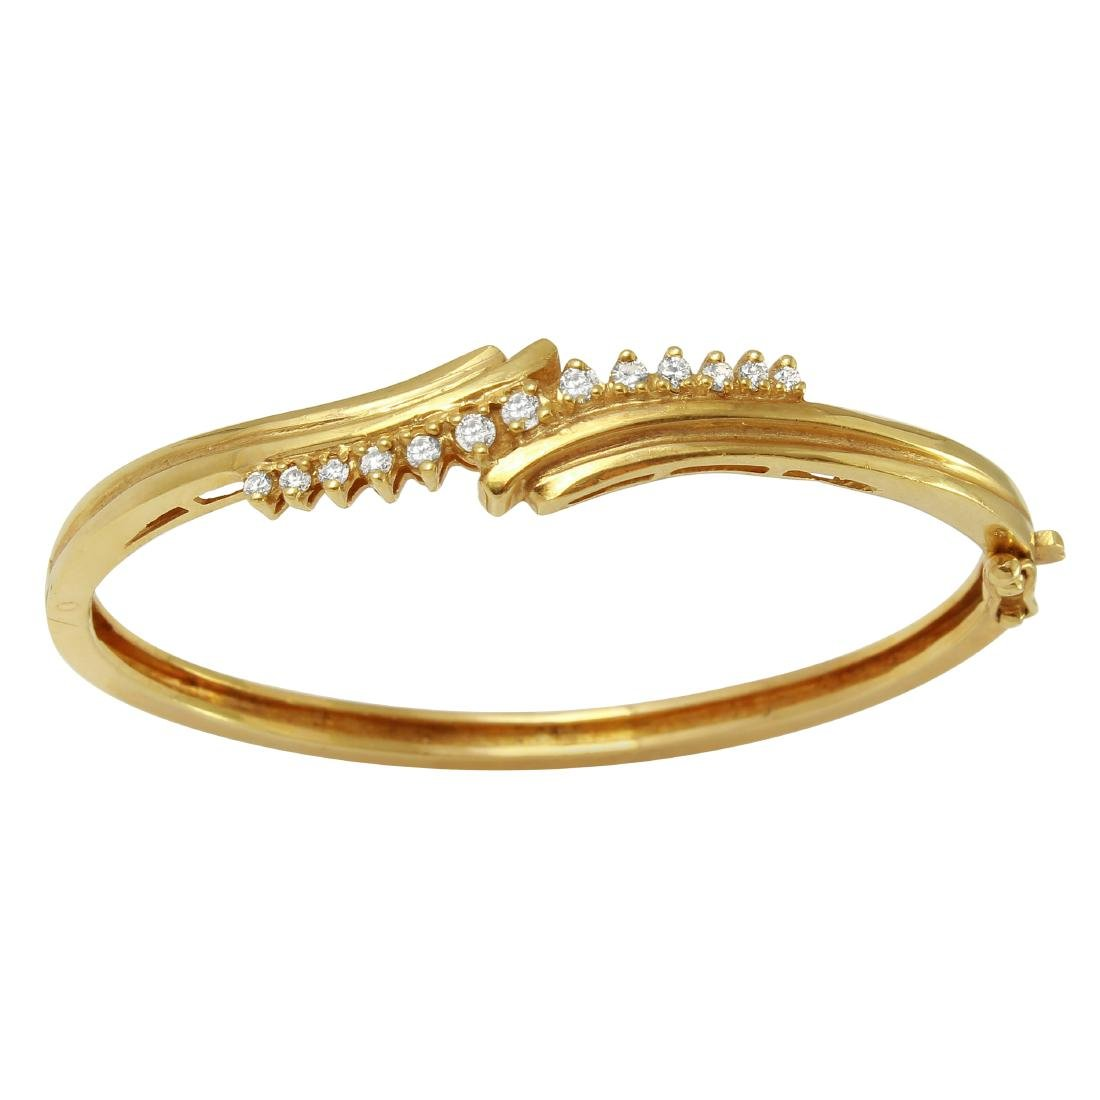 14KT Yellow Gold Diamond Bangle Bracelet